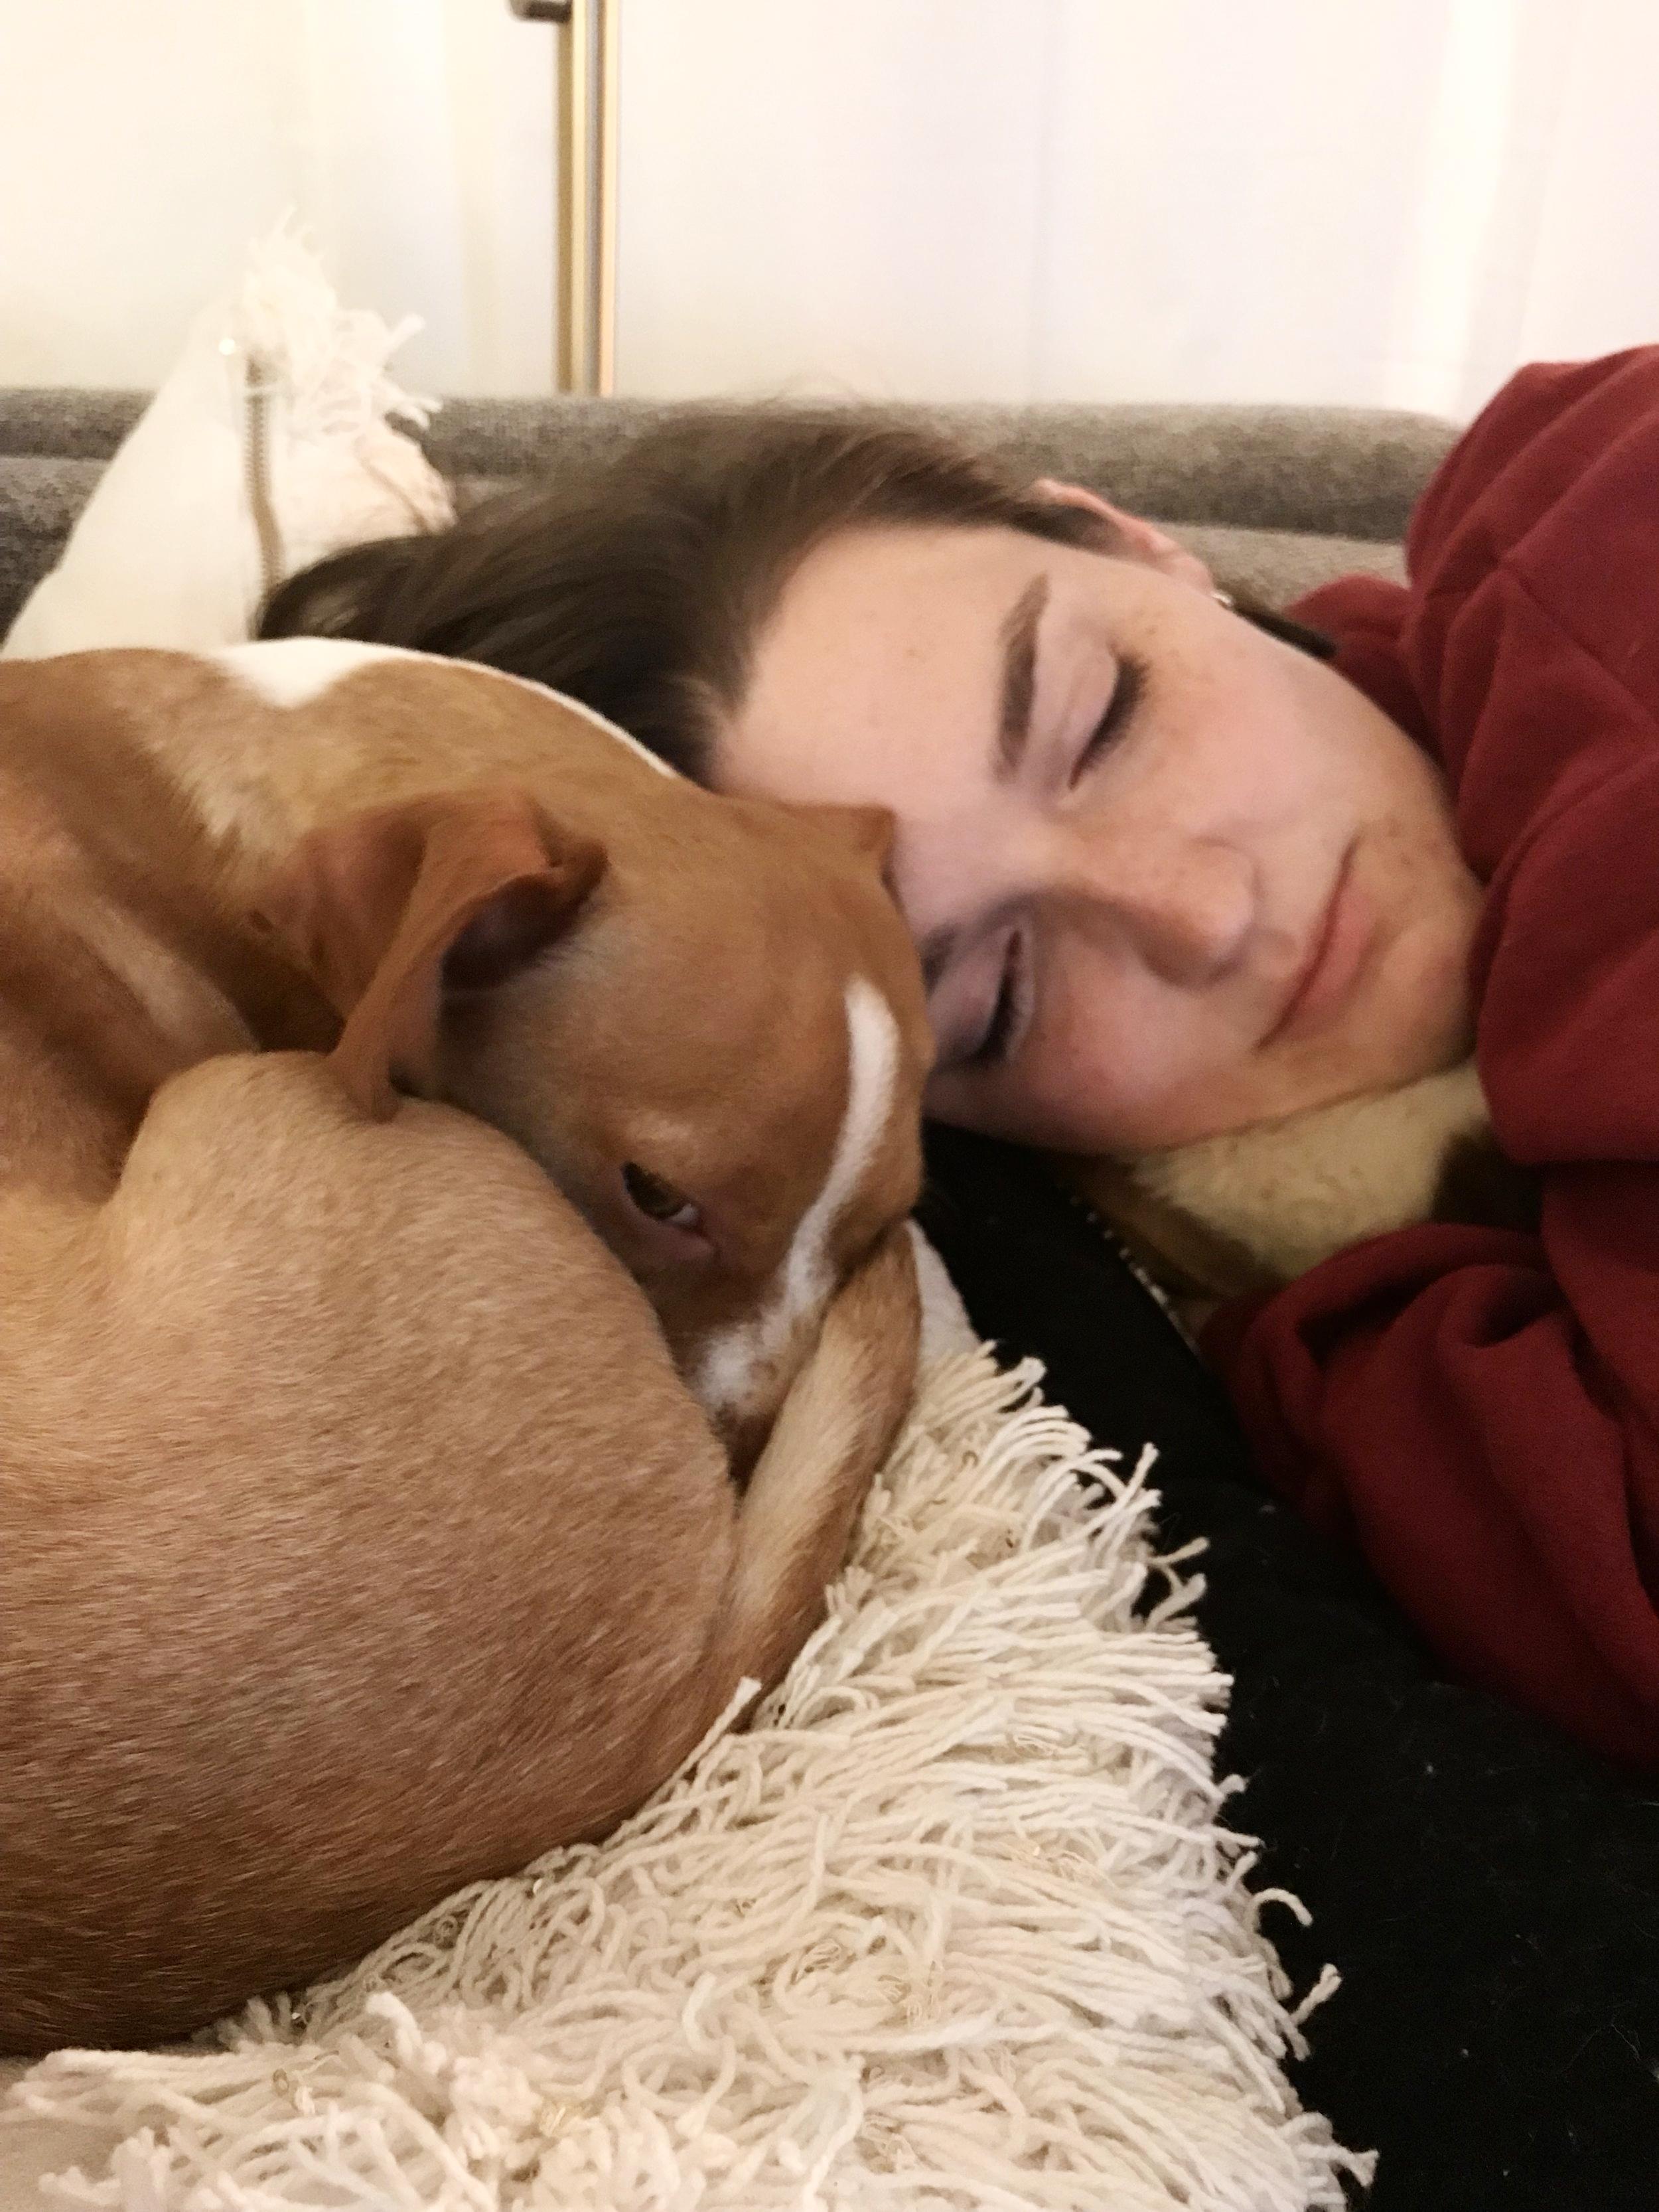 Bean_Sleepy_Dog